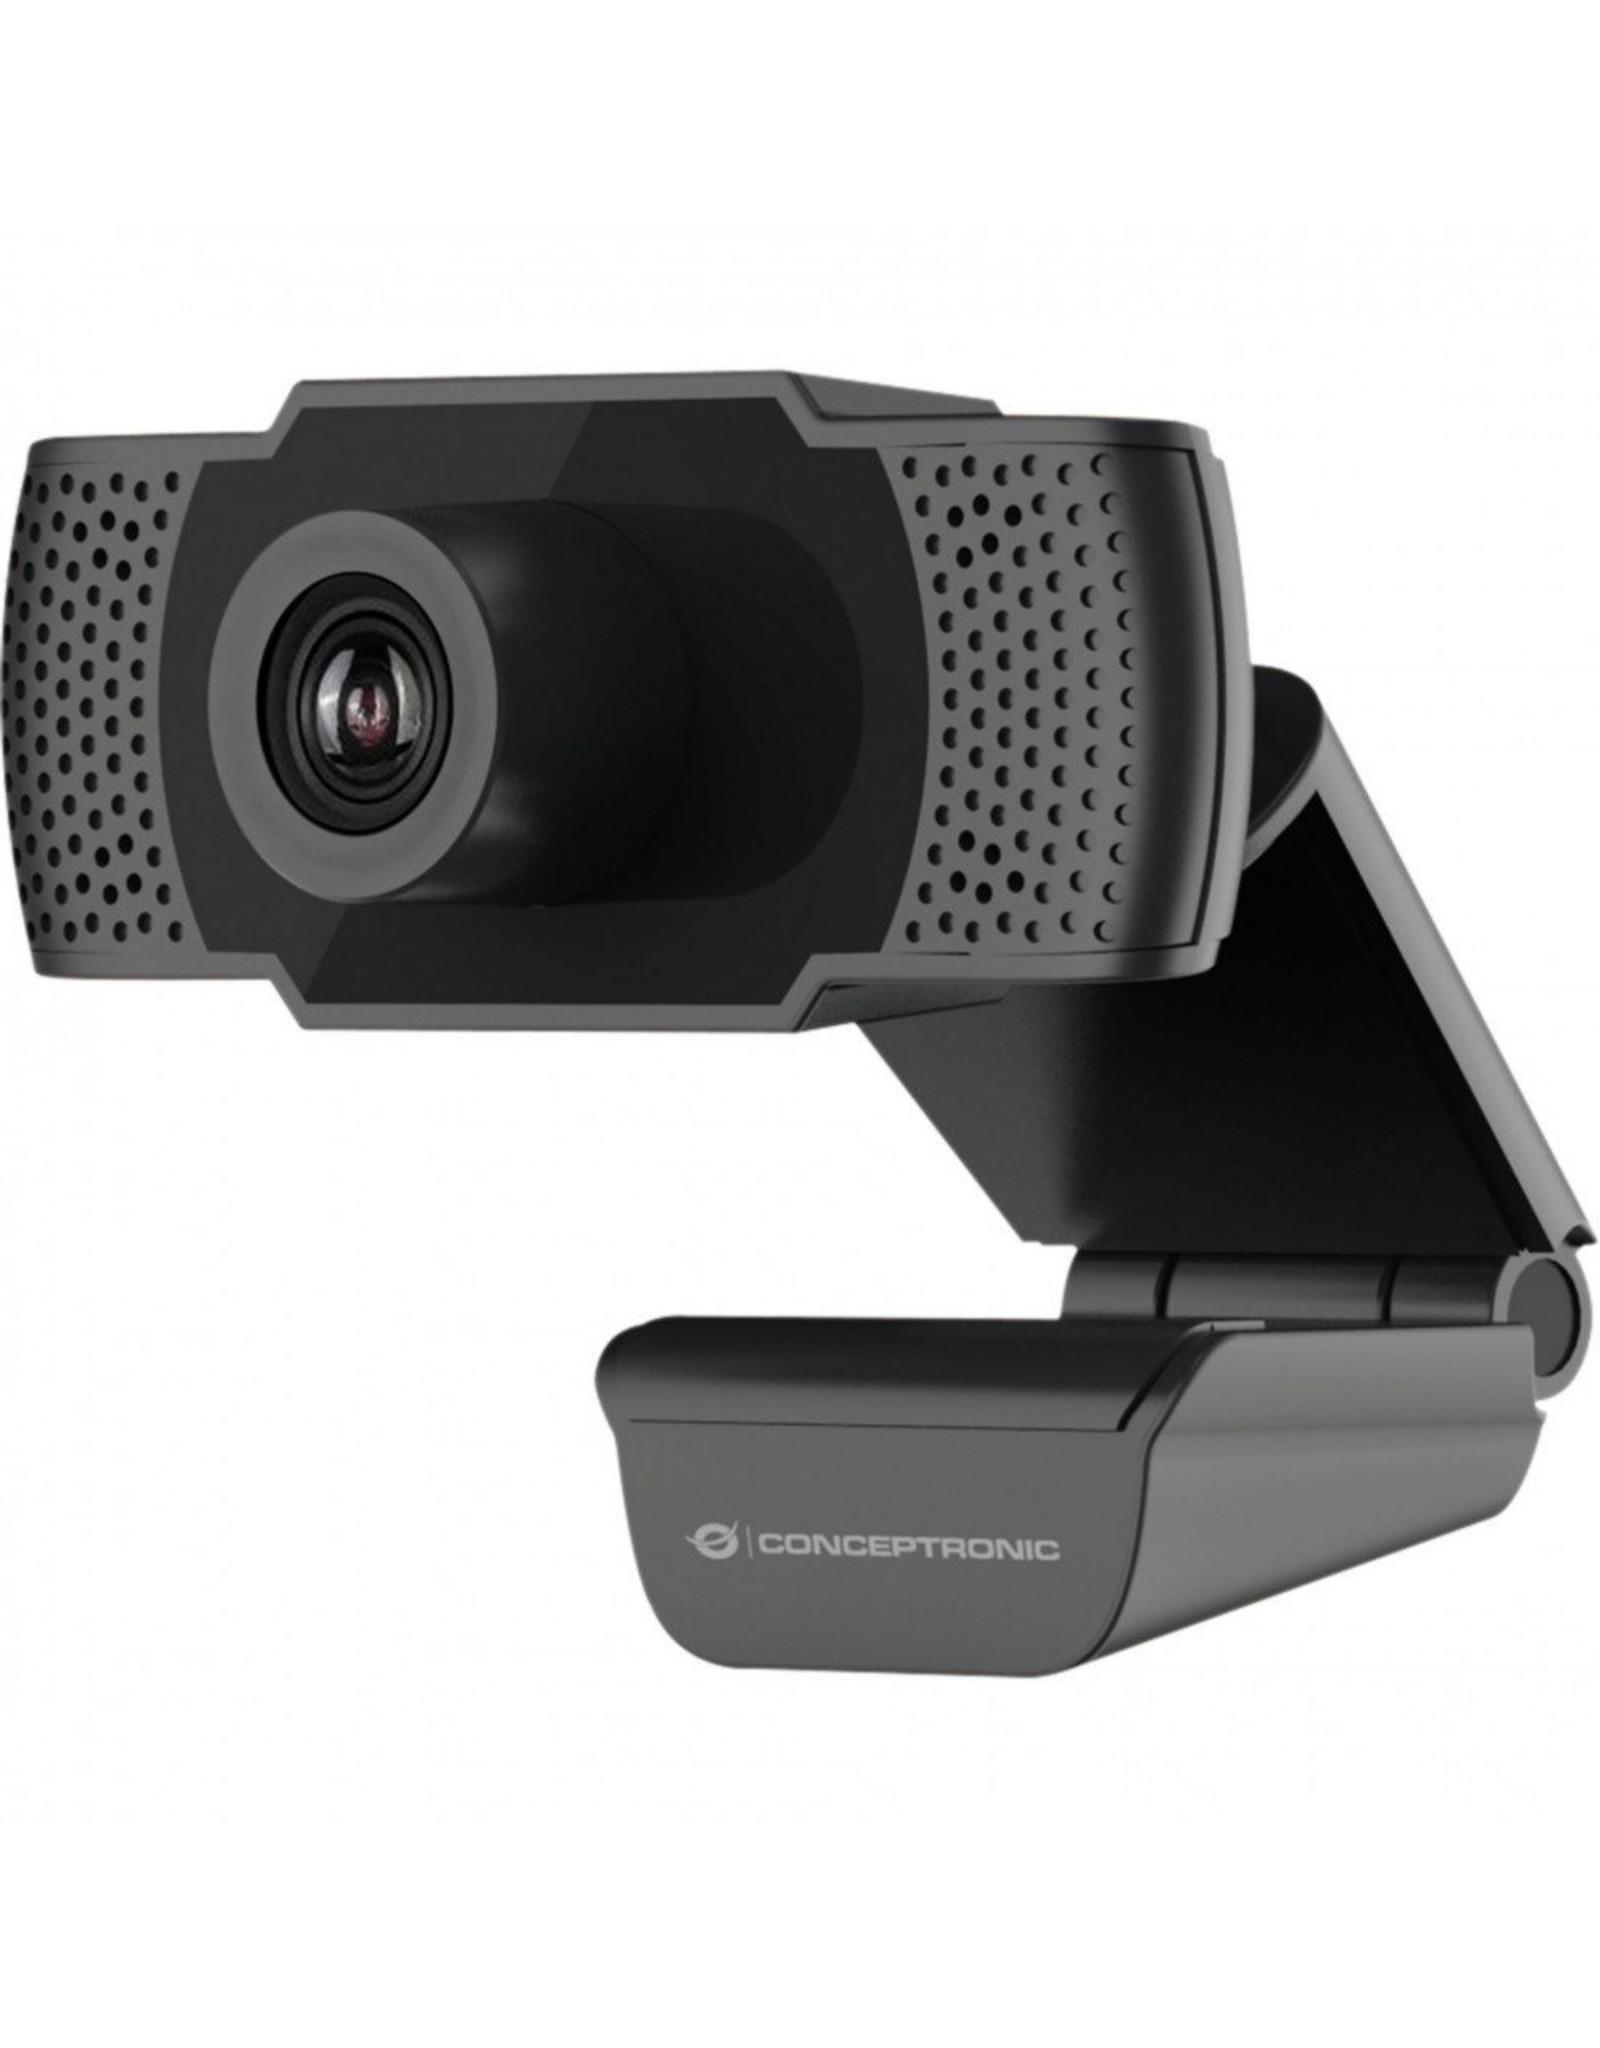 OEM Conceptronic AMDIS webcam 2 MP F-HD USB 2.0 Zwart